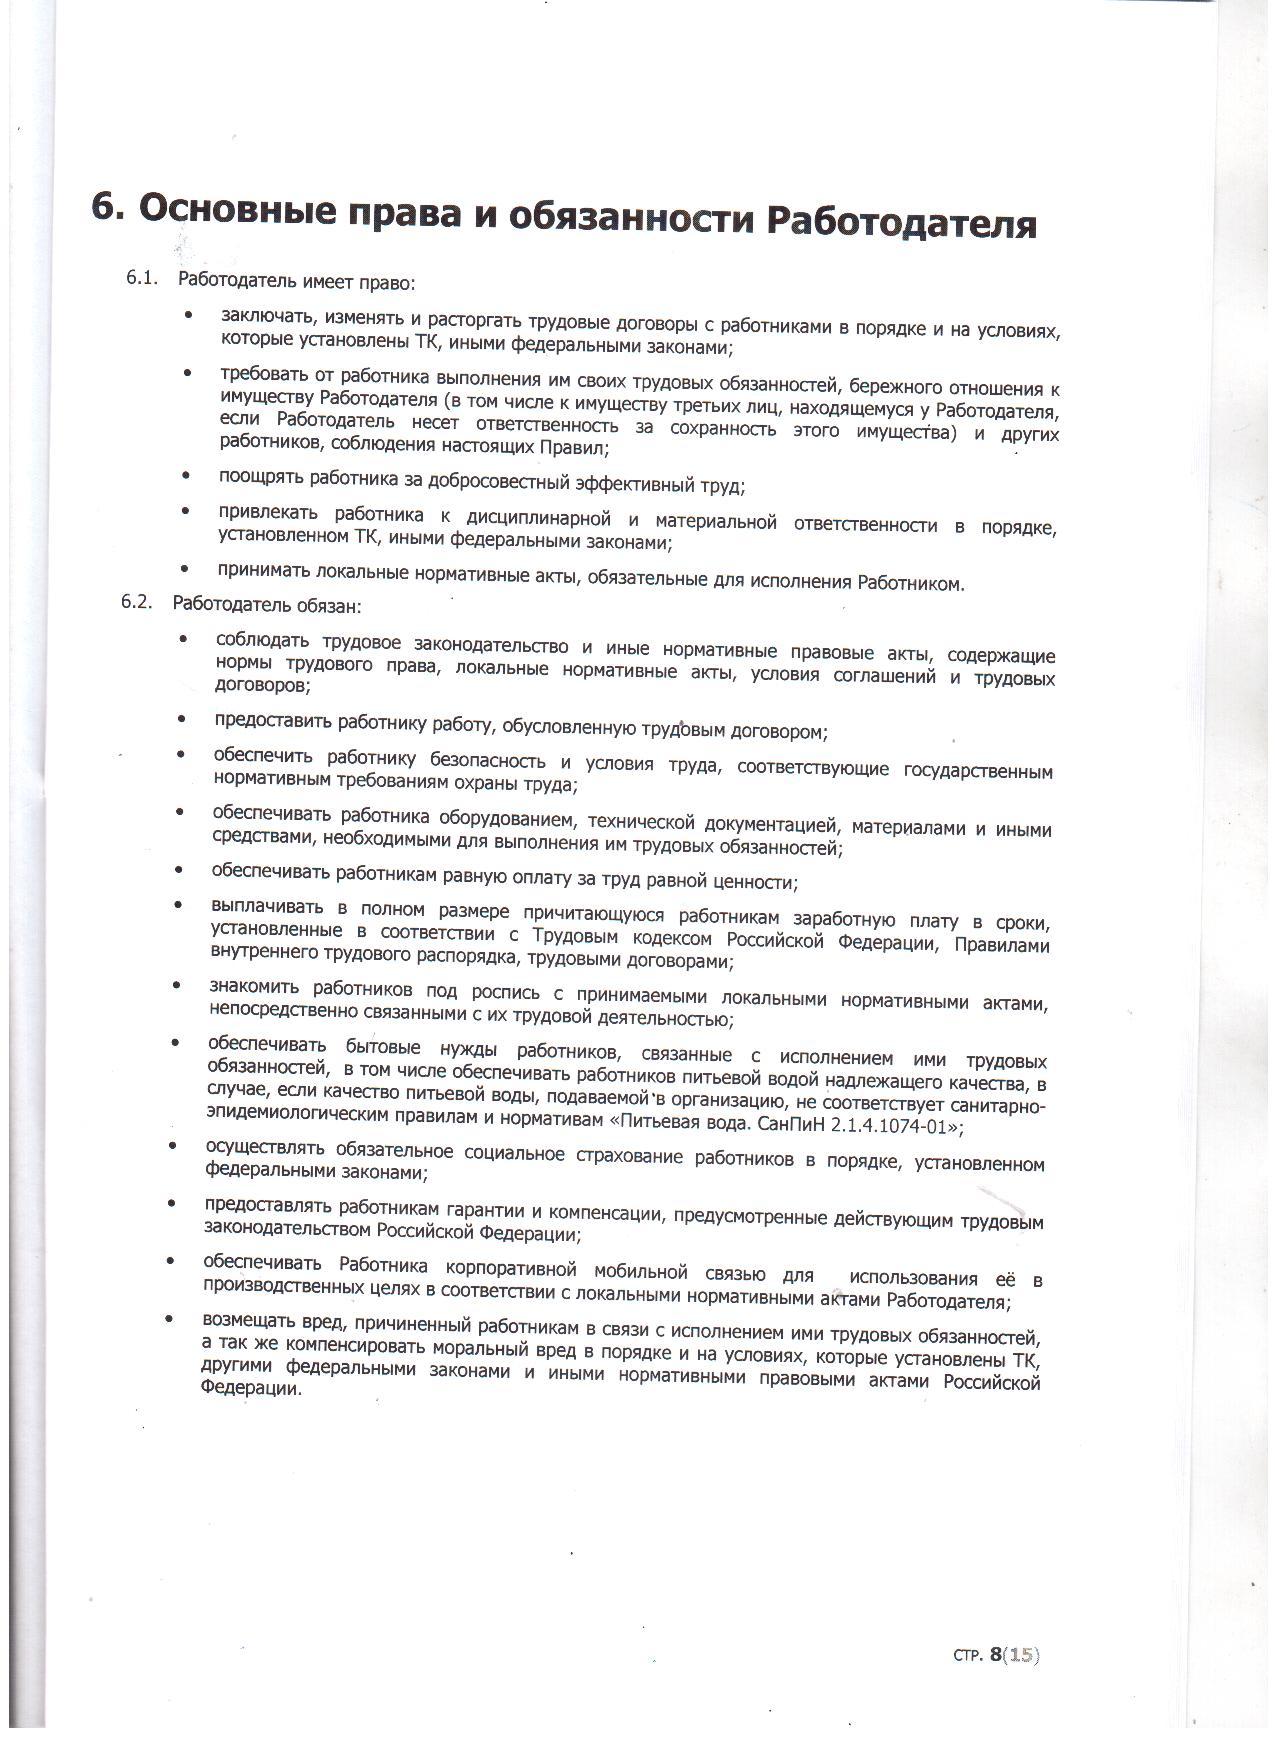 Правила внутреннего трудоговоро распорядка 8